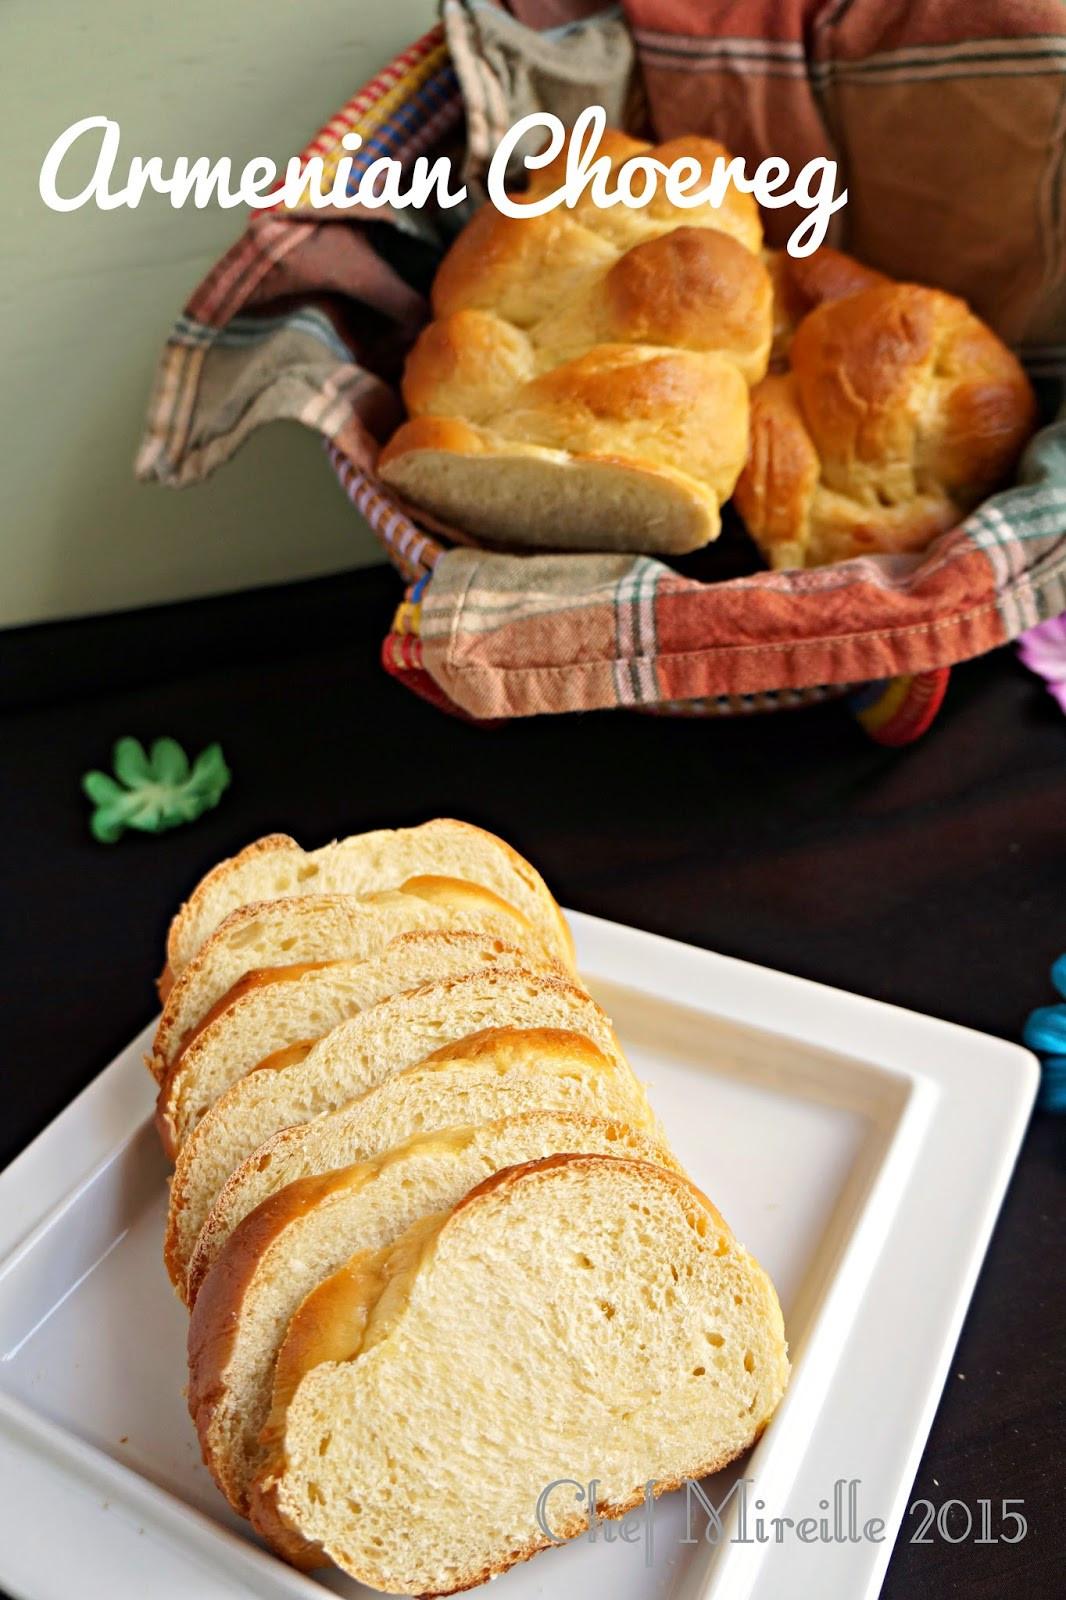 Armenian Easter Bread  Choereg Armenian Easter Bread for BreadBakers The